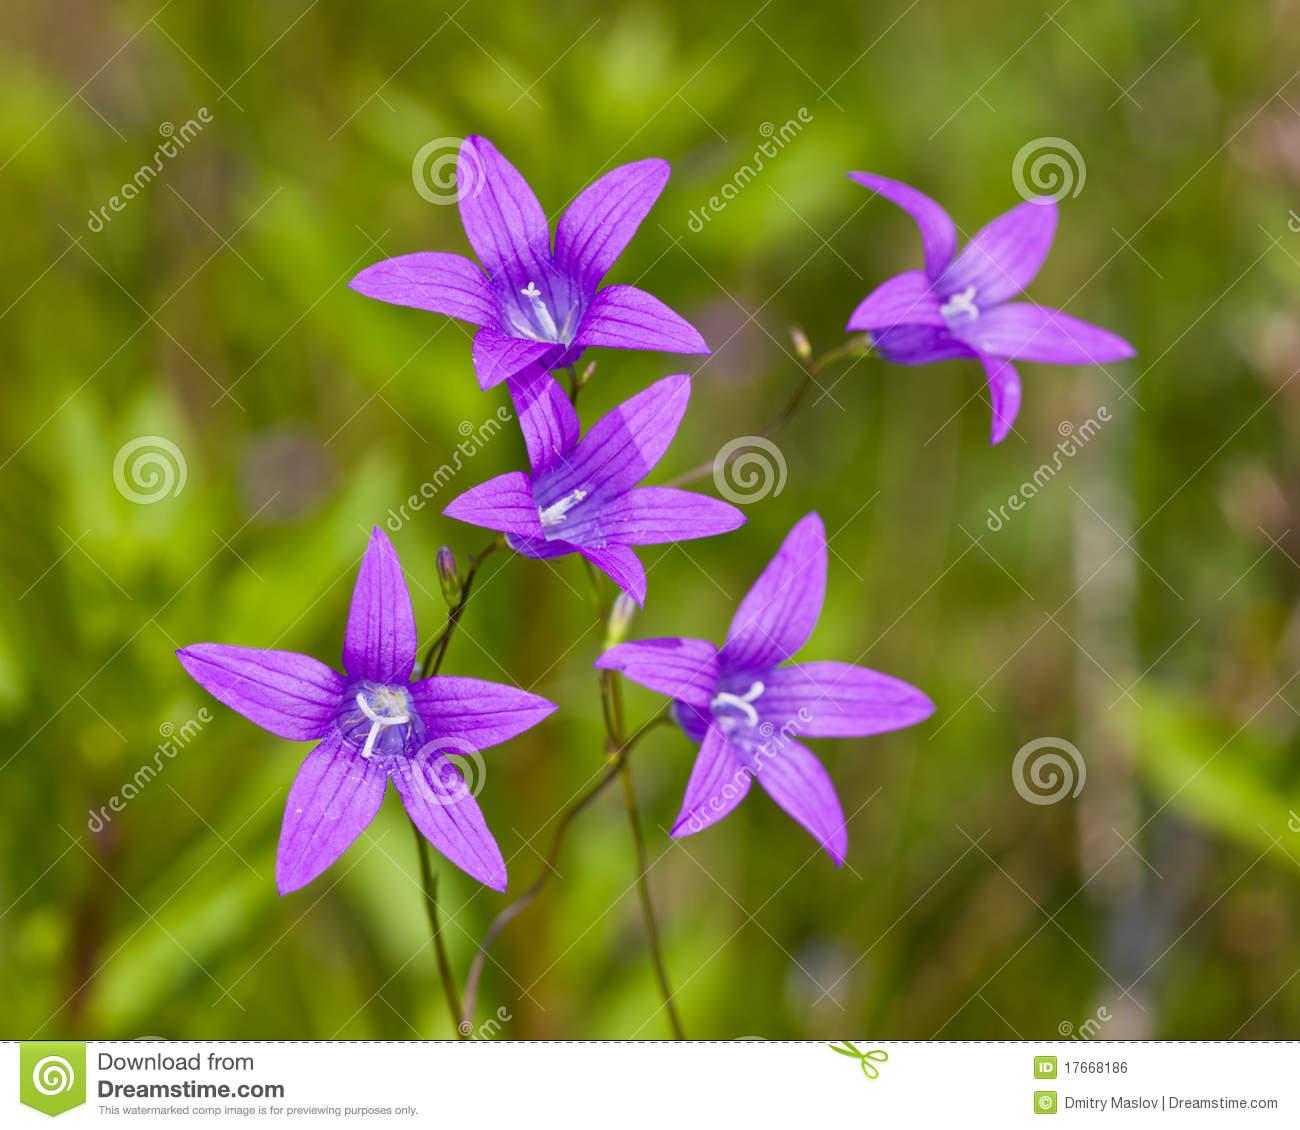 Flower Octet Royalty Free Stock Image.